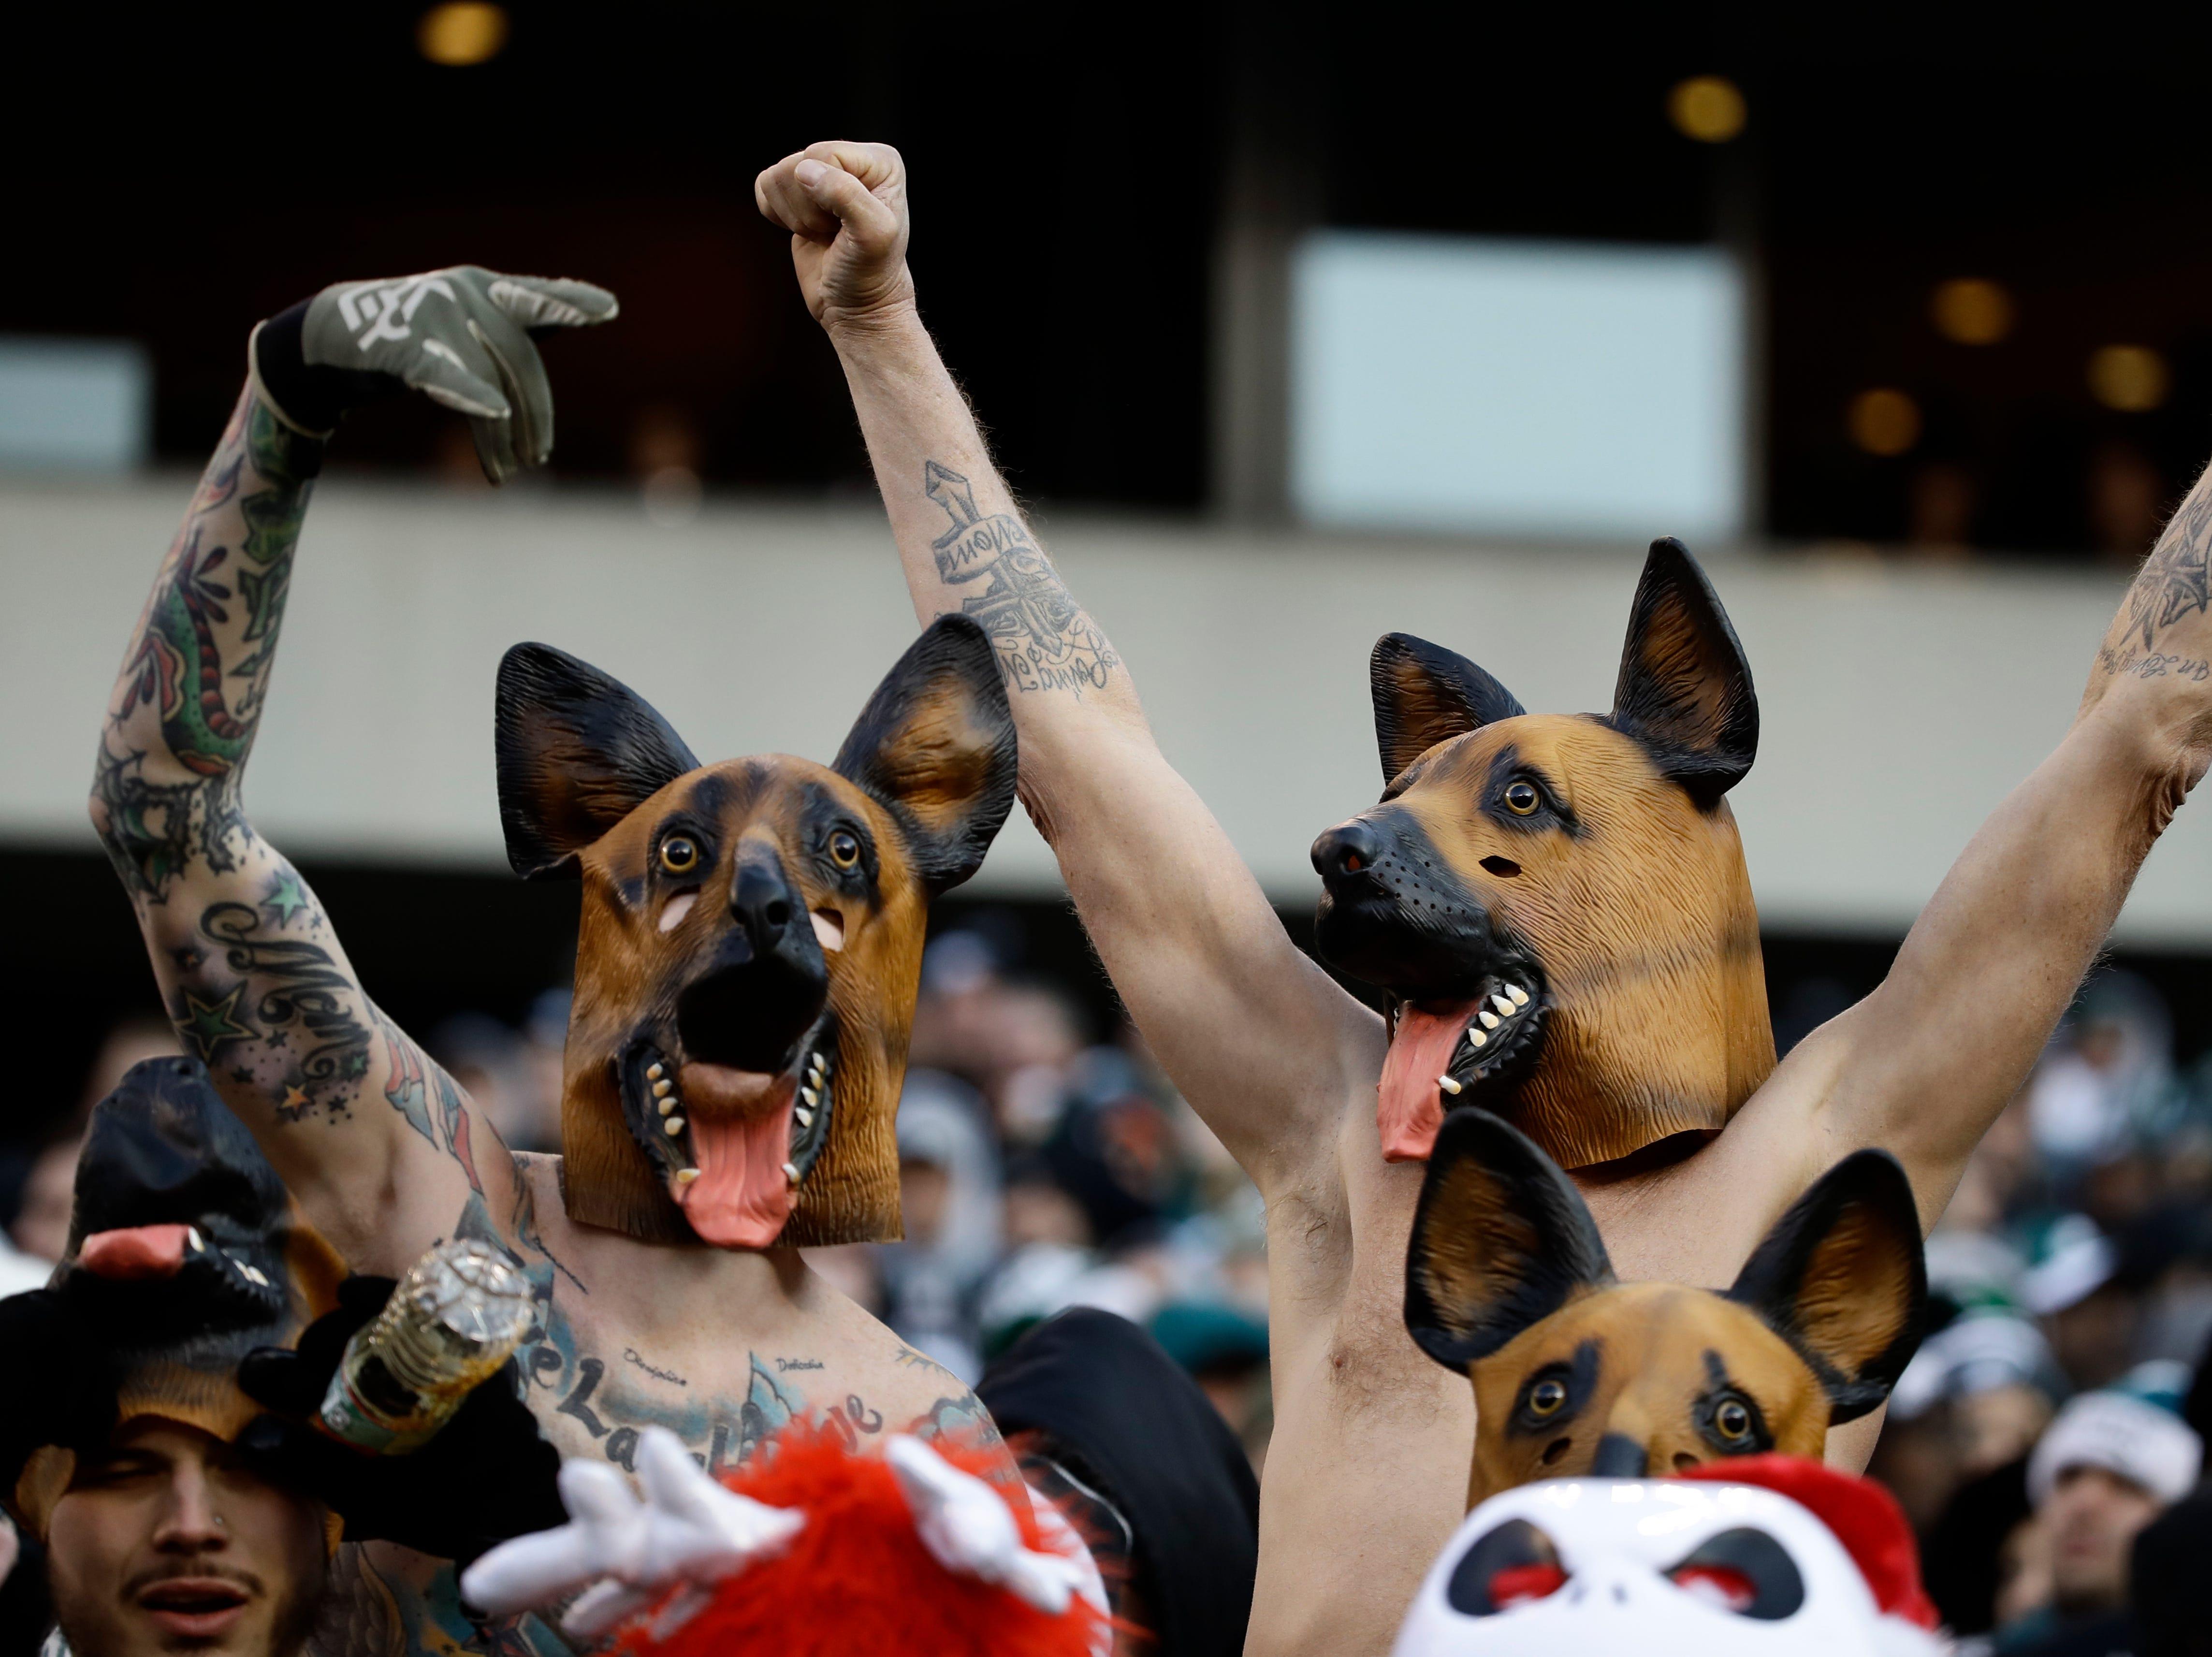 Philadelphia Eagles' fans cheer during the second half of an NFL football game against the Houston Texans, Sunday, Dec. 23, 2018, in Philadelphia. (AP Photo/Matt Rourke)